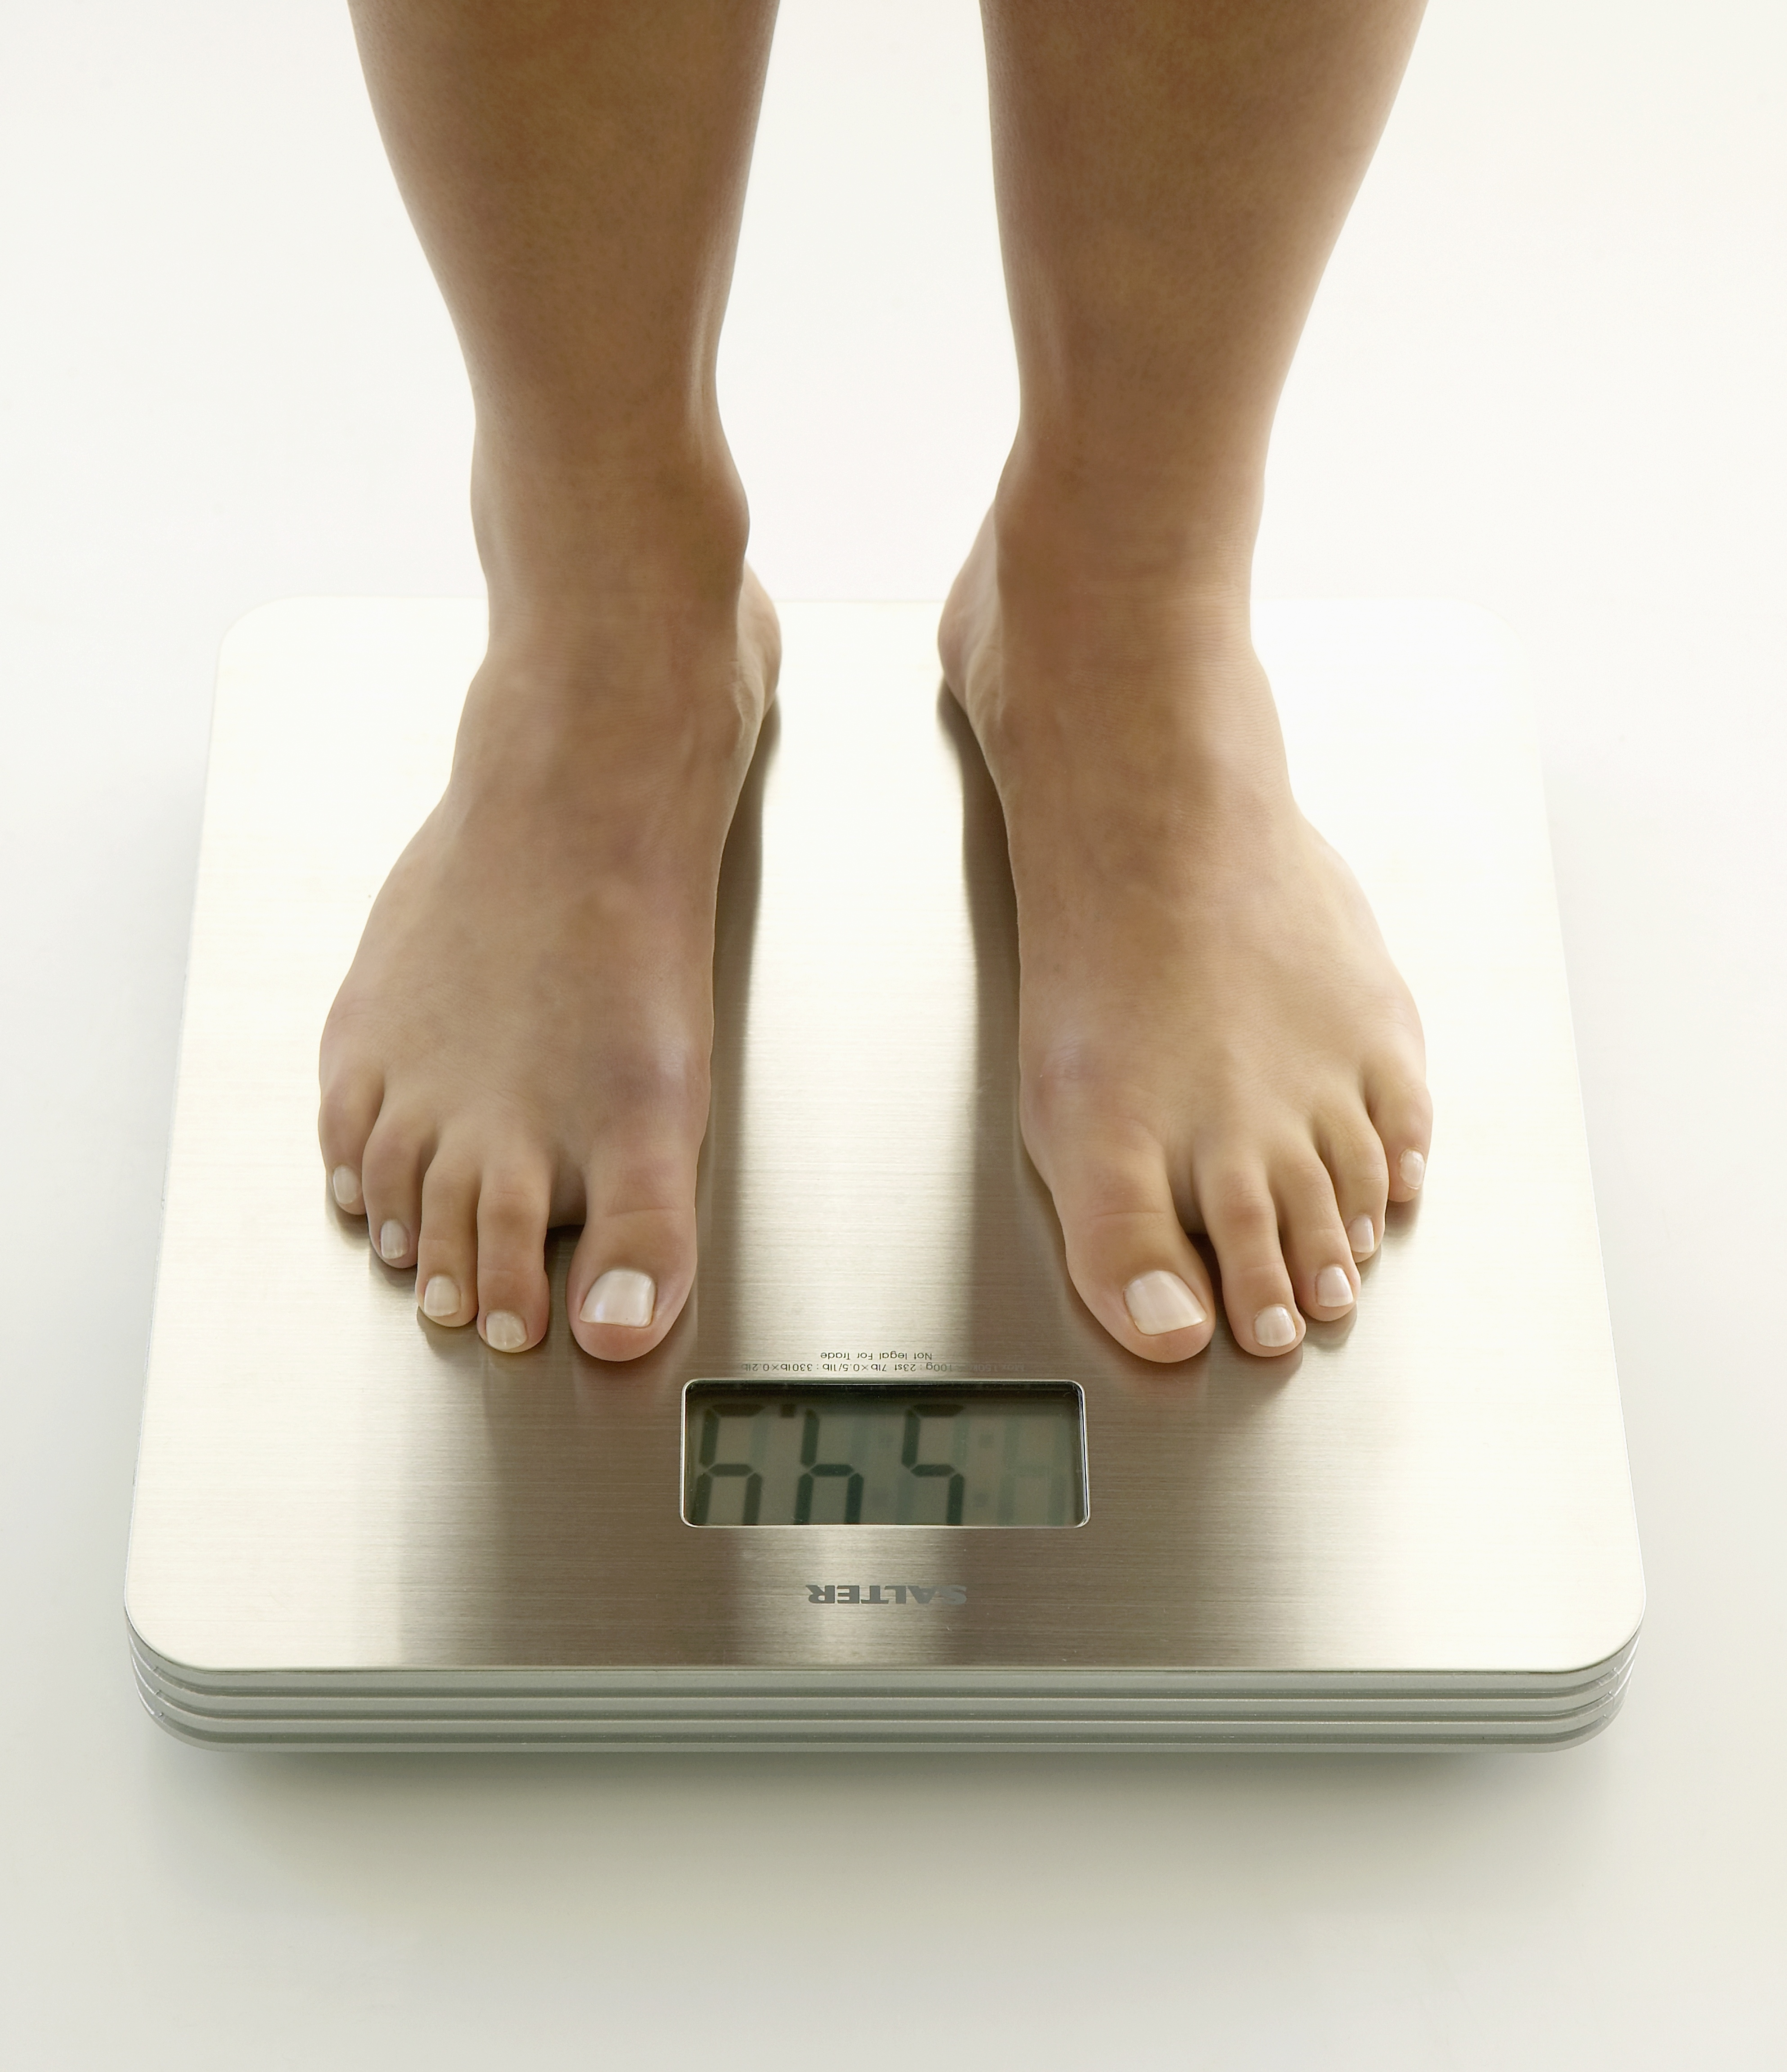 pierde in greutate doar corpul inferior)